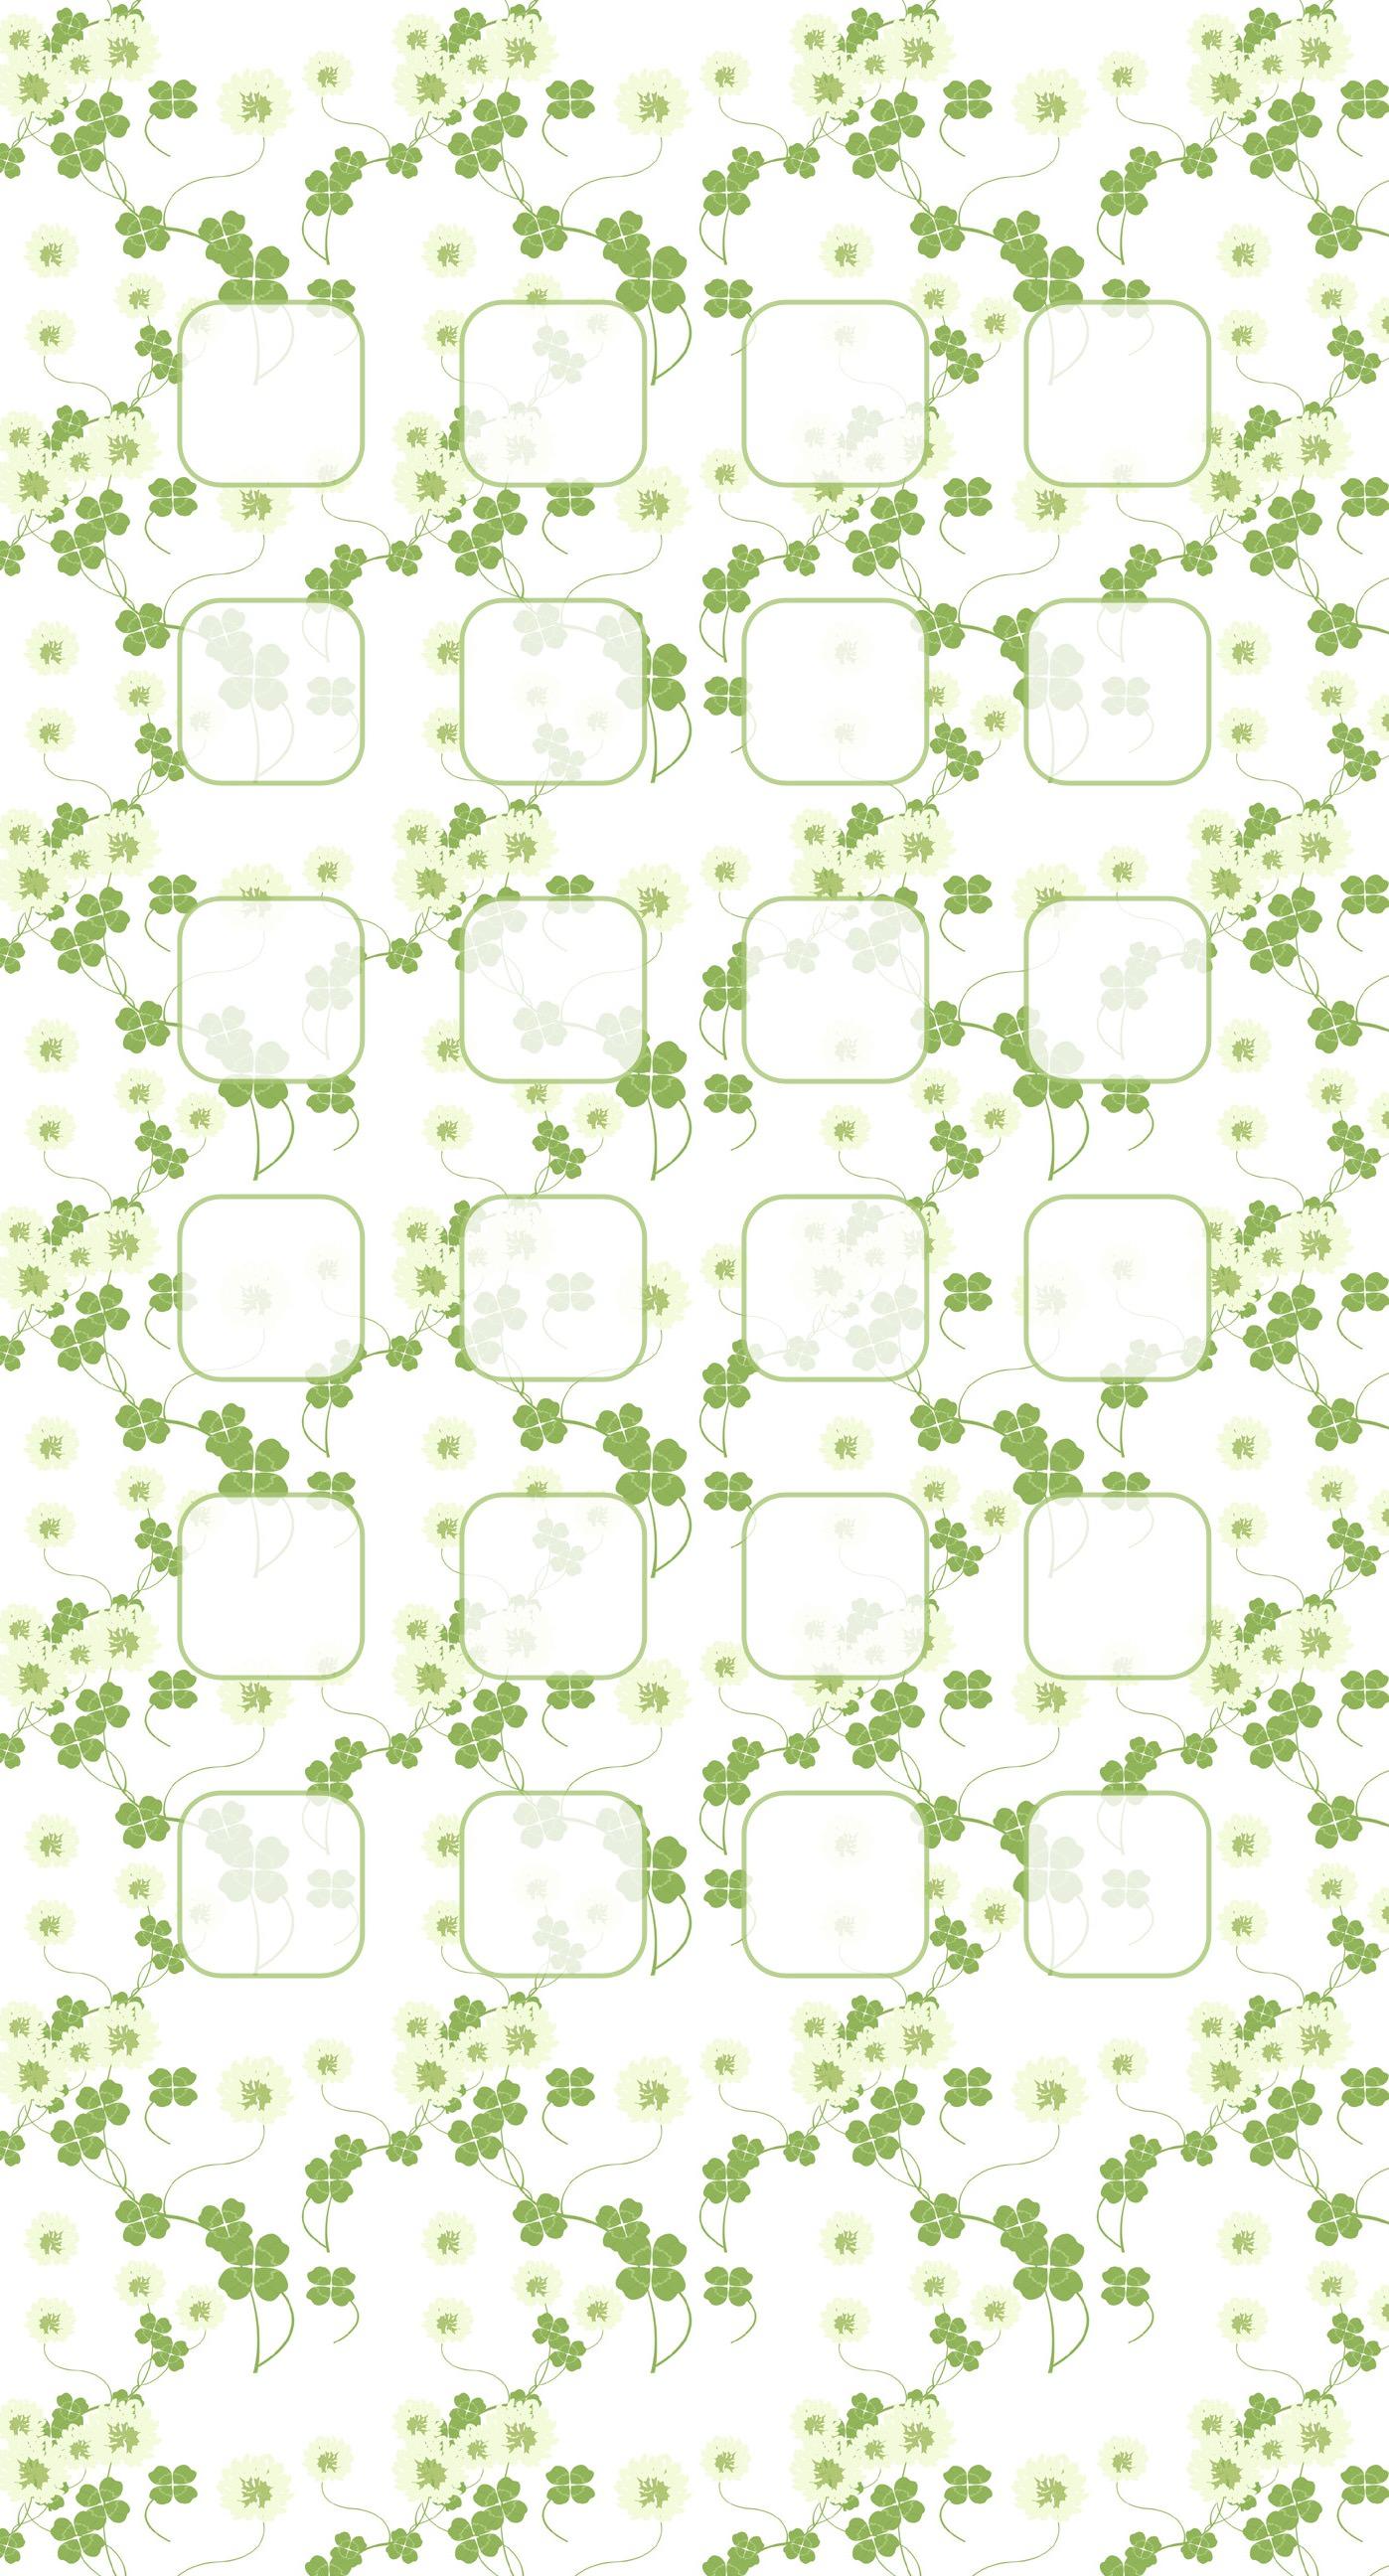 Clover pattern illustrations green shelf wallpapersc iPhone7Plus 1398x2592